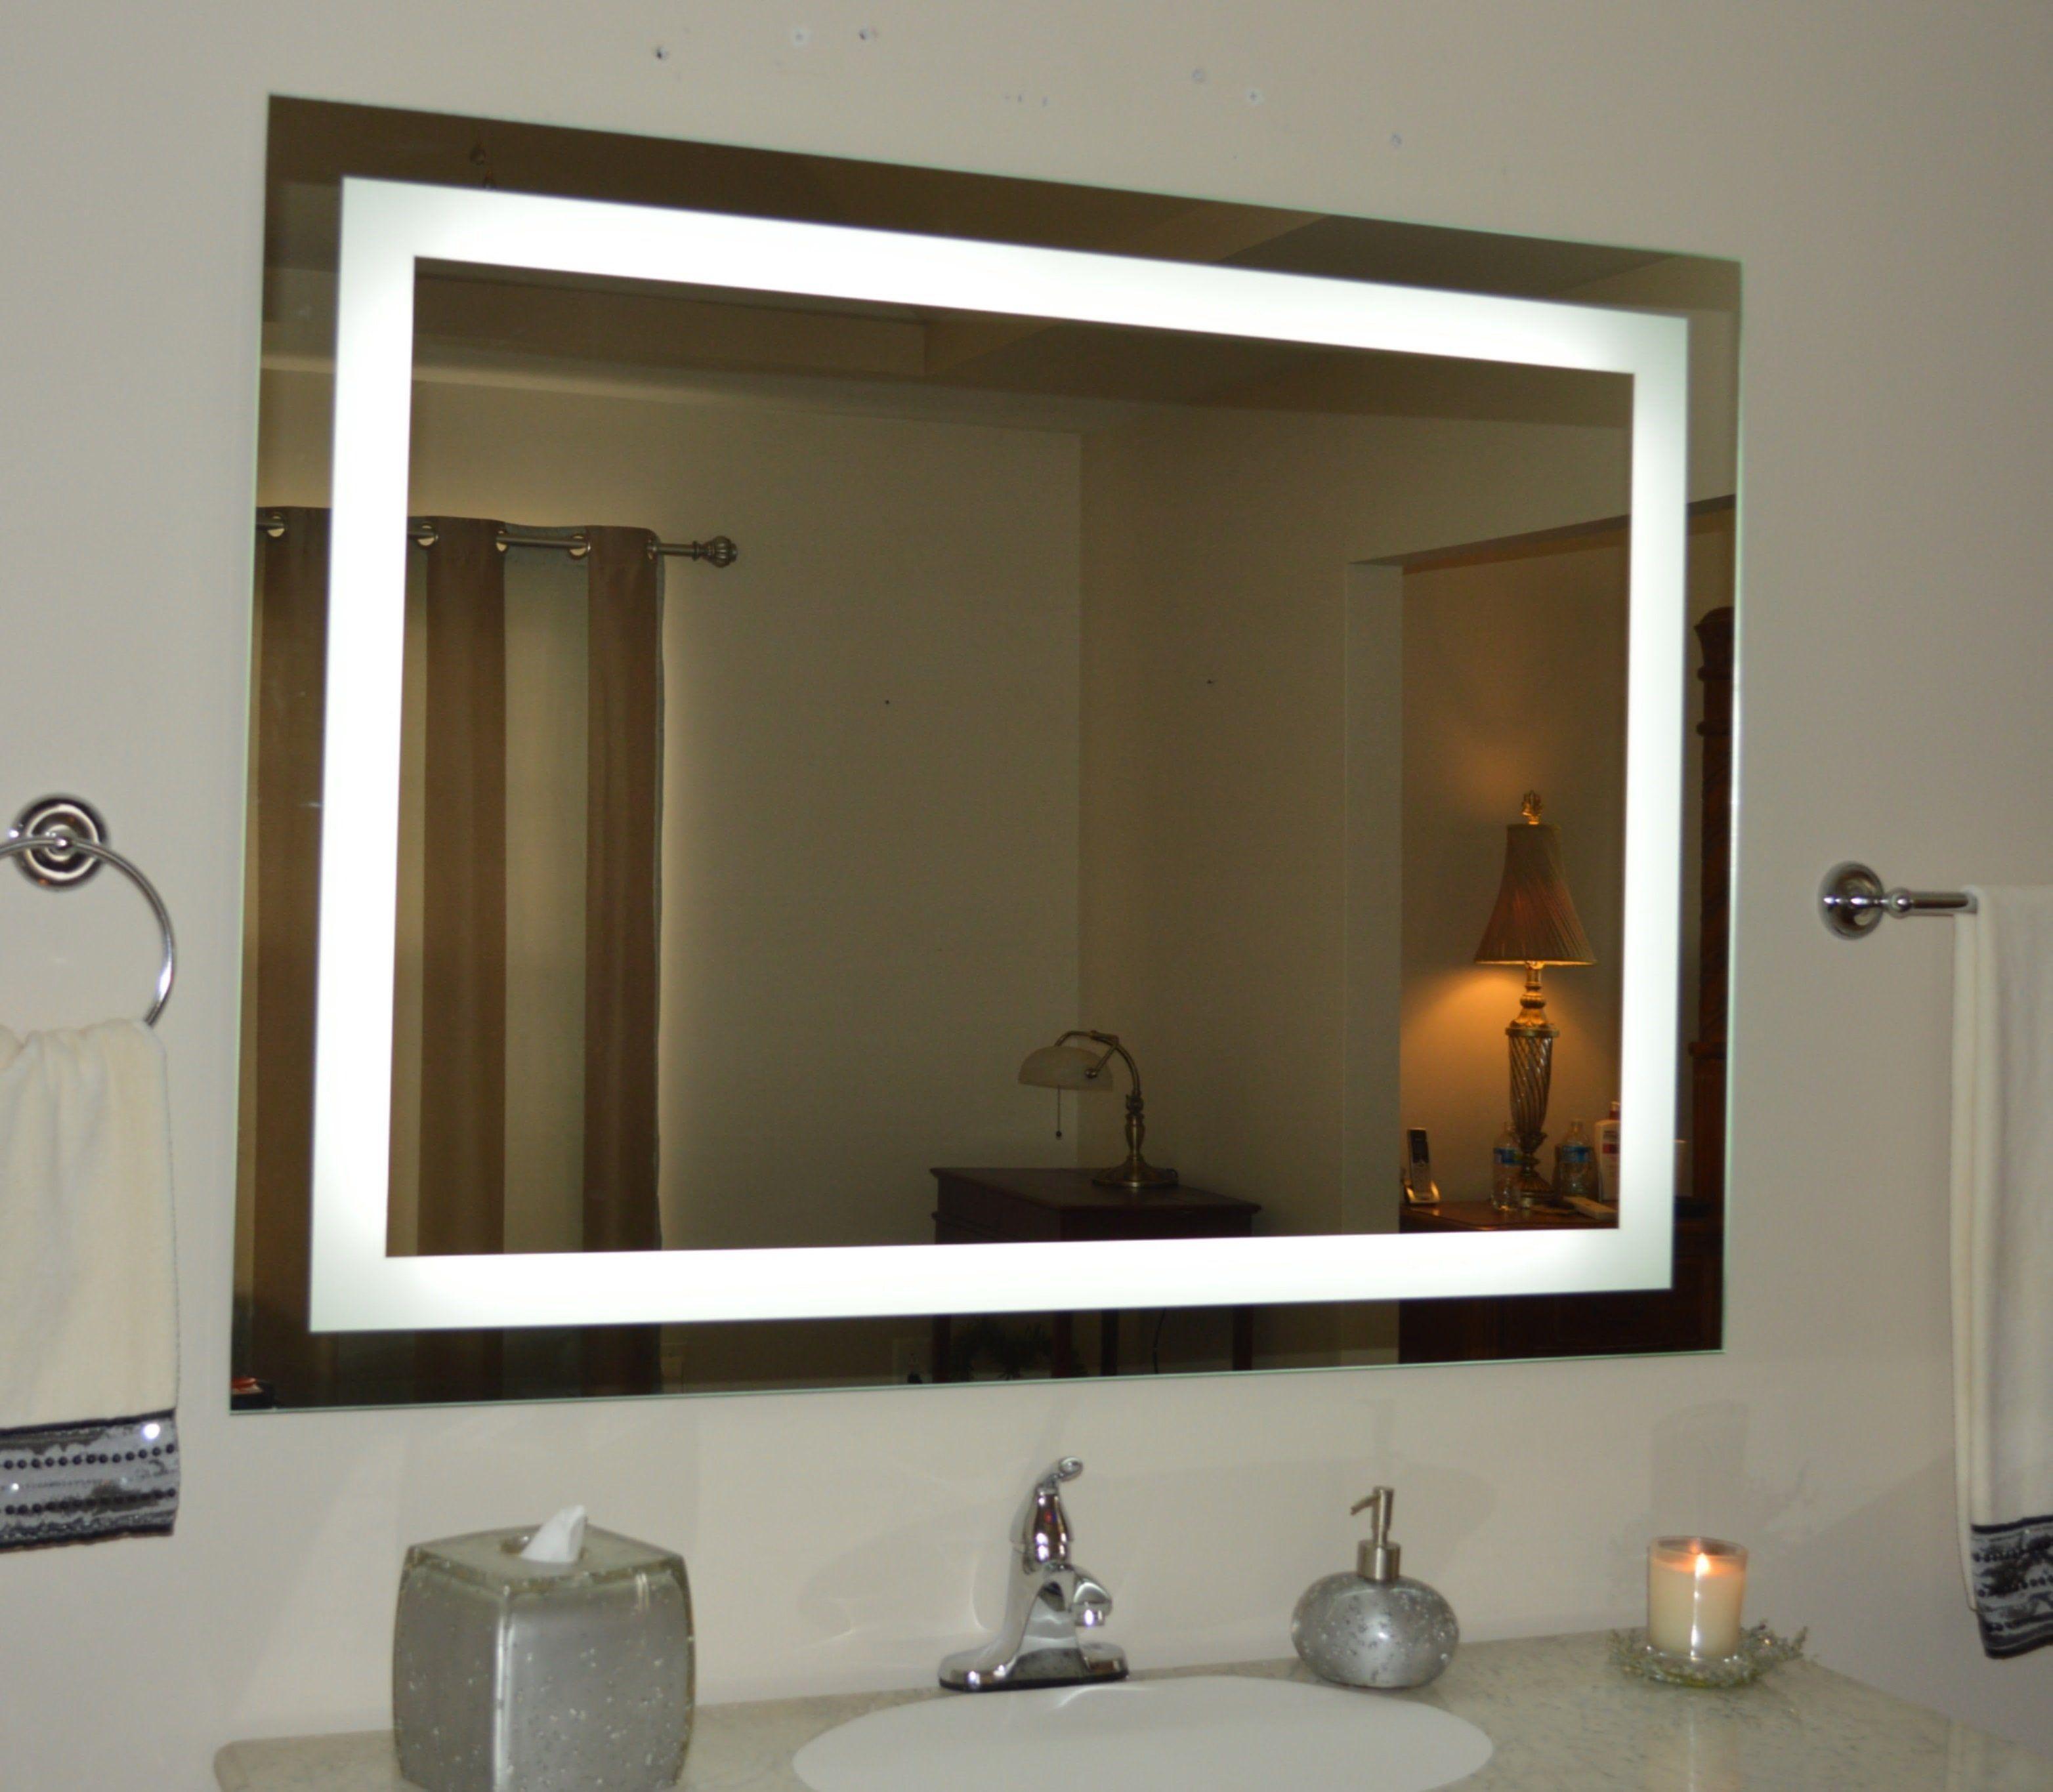 Front Lighted Led Bathroom Vanity Mirror 48 Mirror Wall Bathroom Bathroom Mirror Lights Led Mirror Bathroom